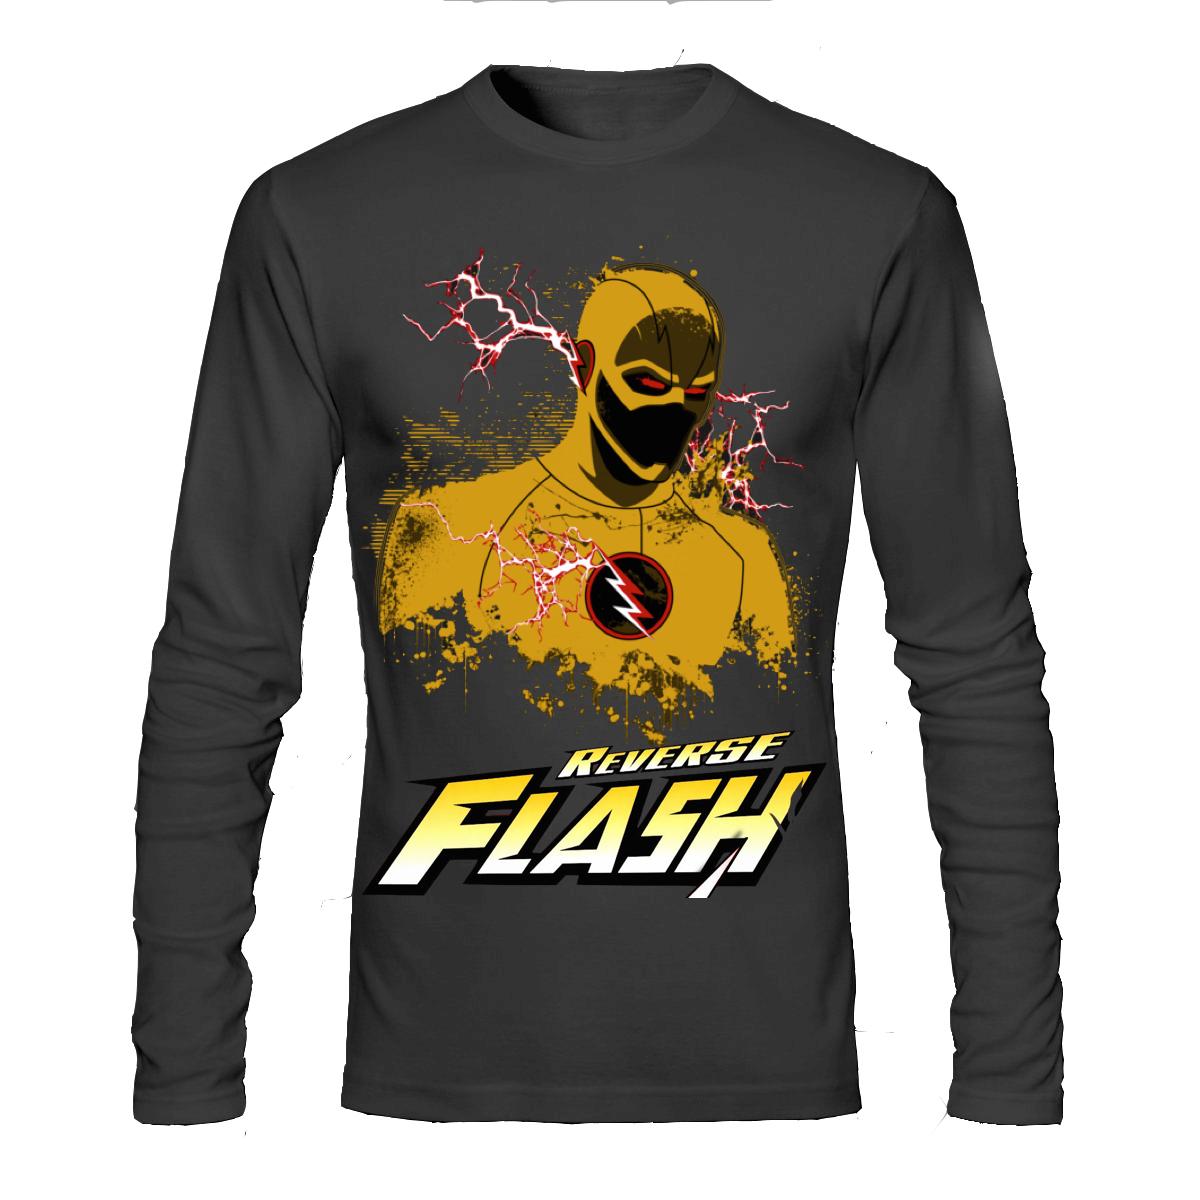 Flash t-shirt designer